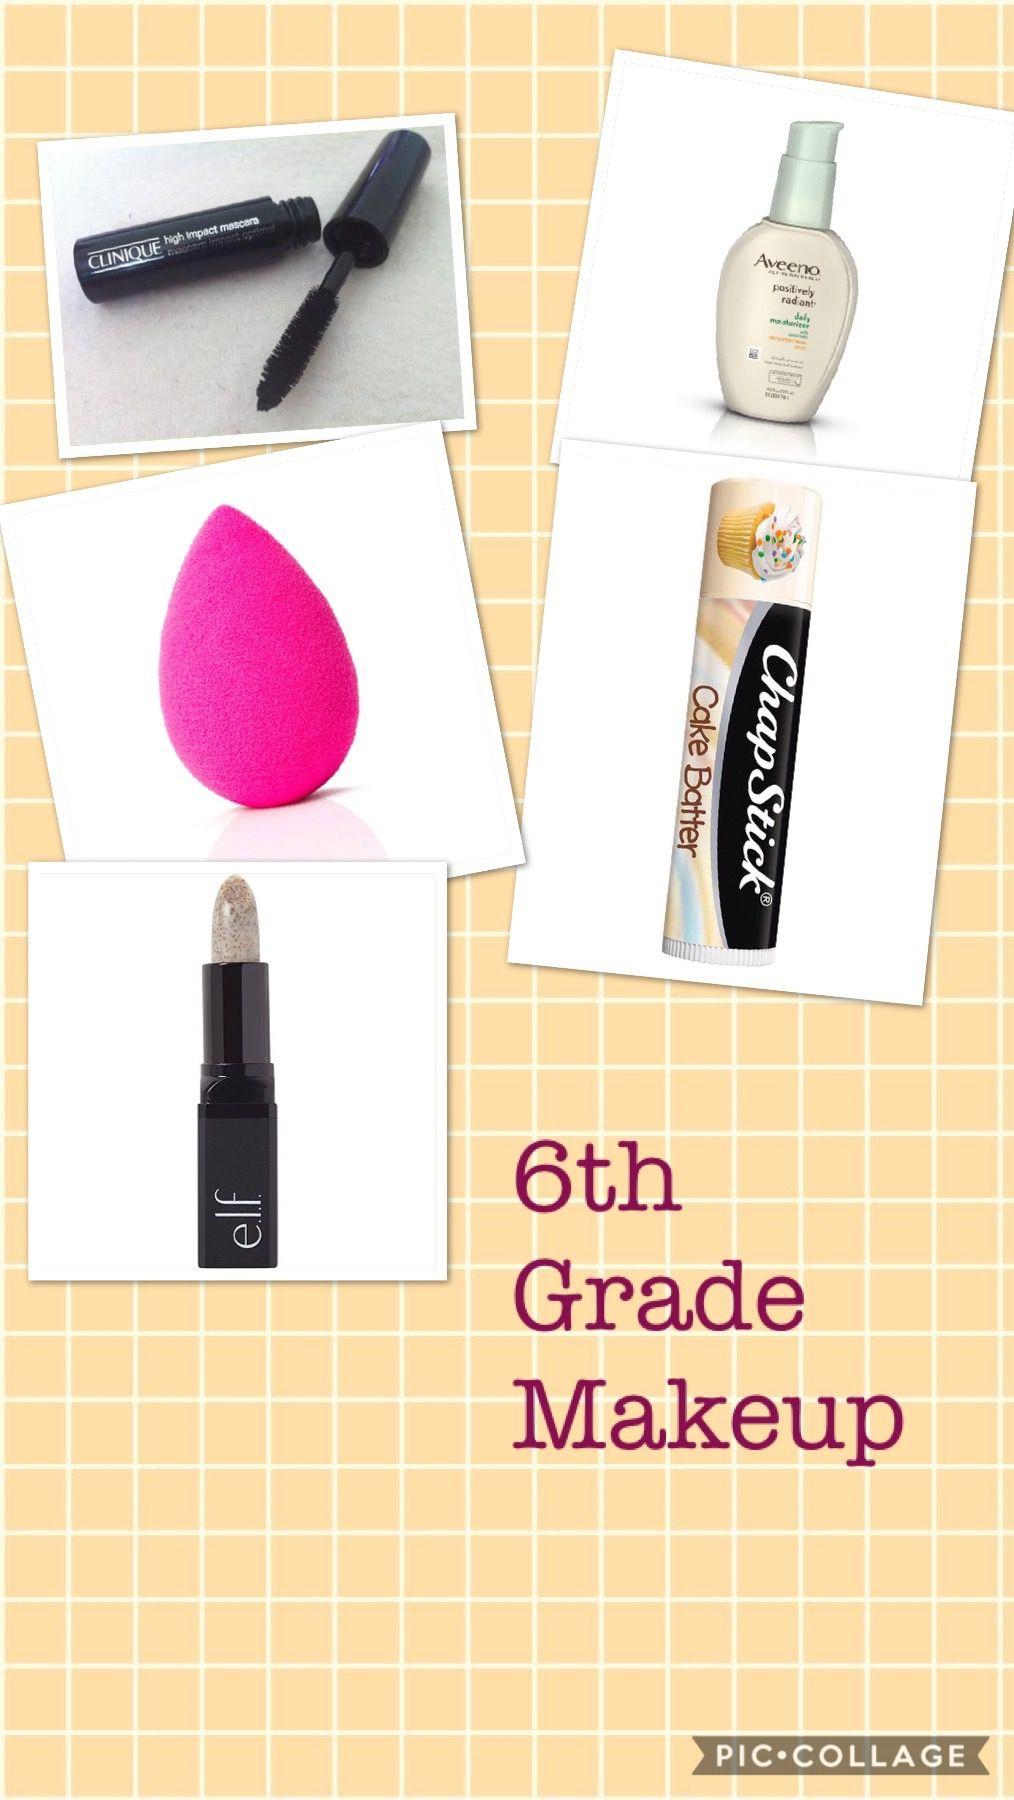 6th grade simple makeup 6th grade makeup, Middle school